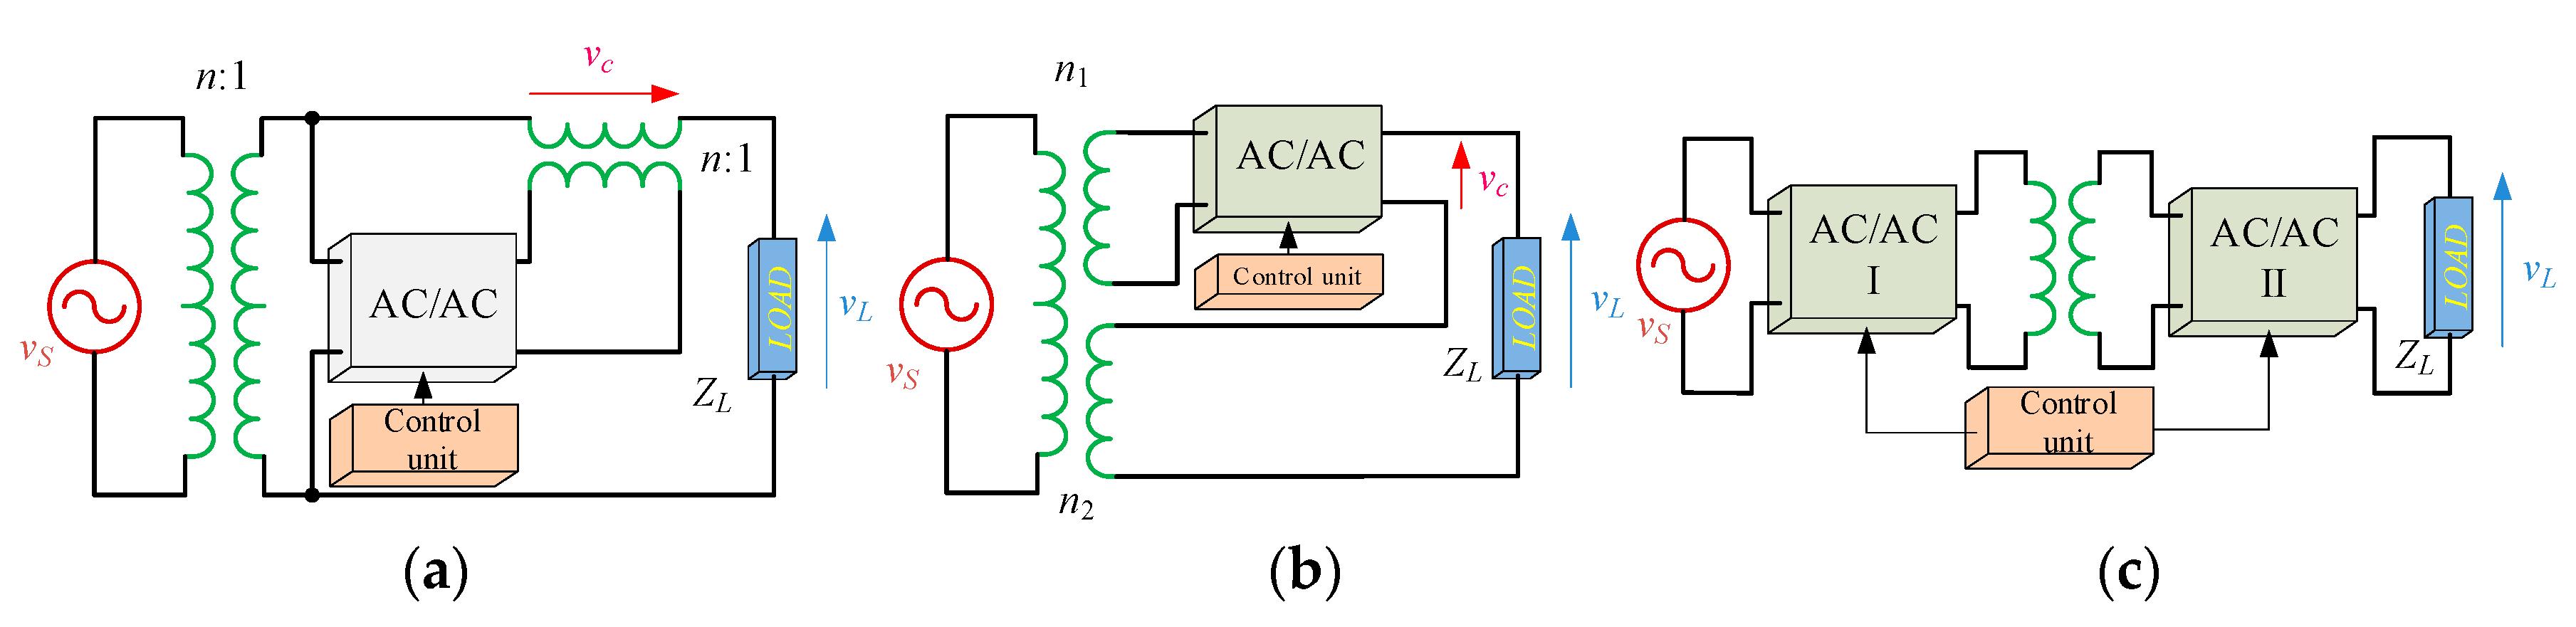 Figure 1 Discrete Overvoltage Protection Circuit